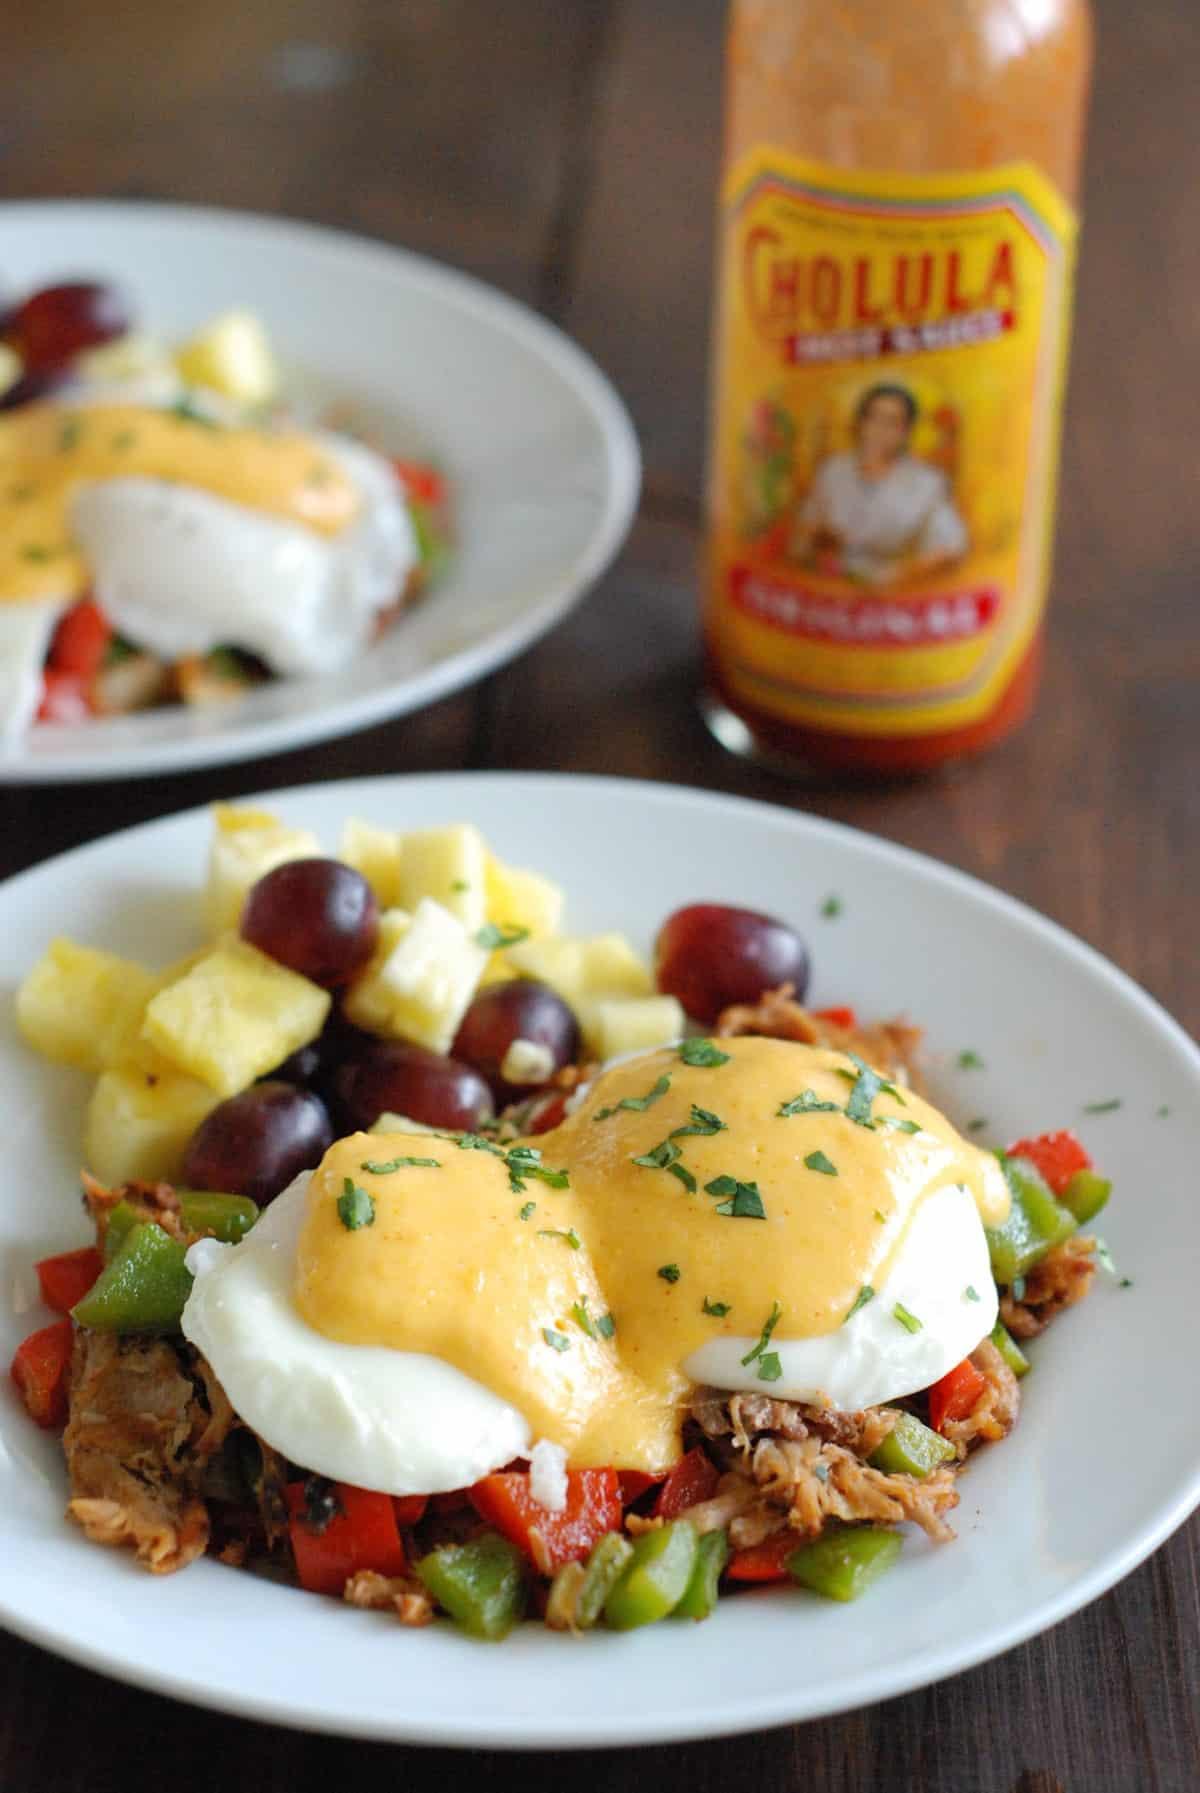 cholula-huevos-rancheros-benedict